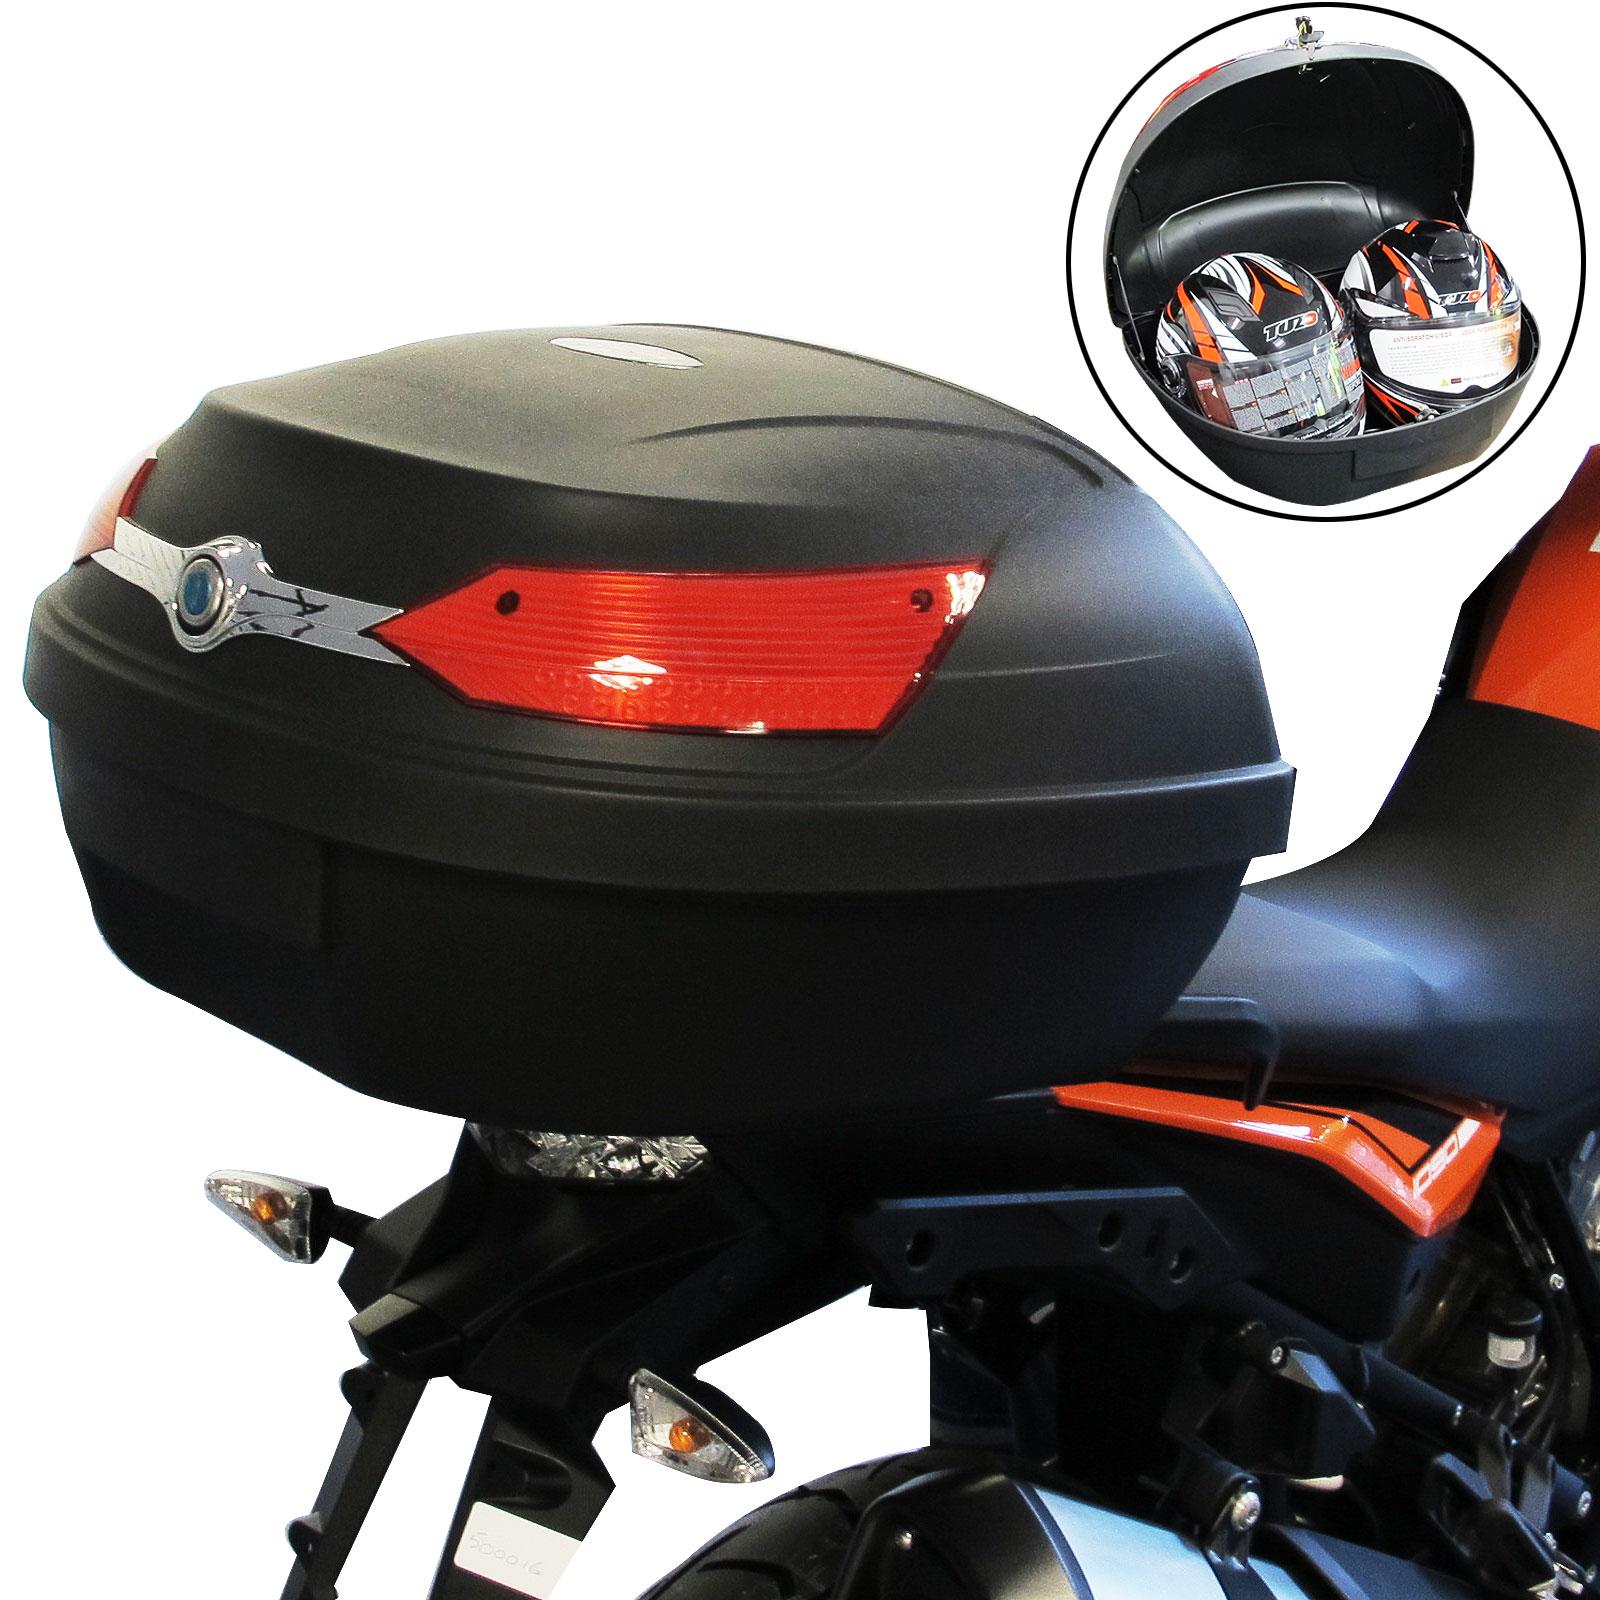 Honda Cr Z Supercharger Uk: M P Motorcycle Parts Swansea